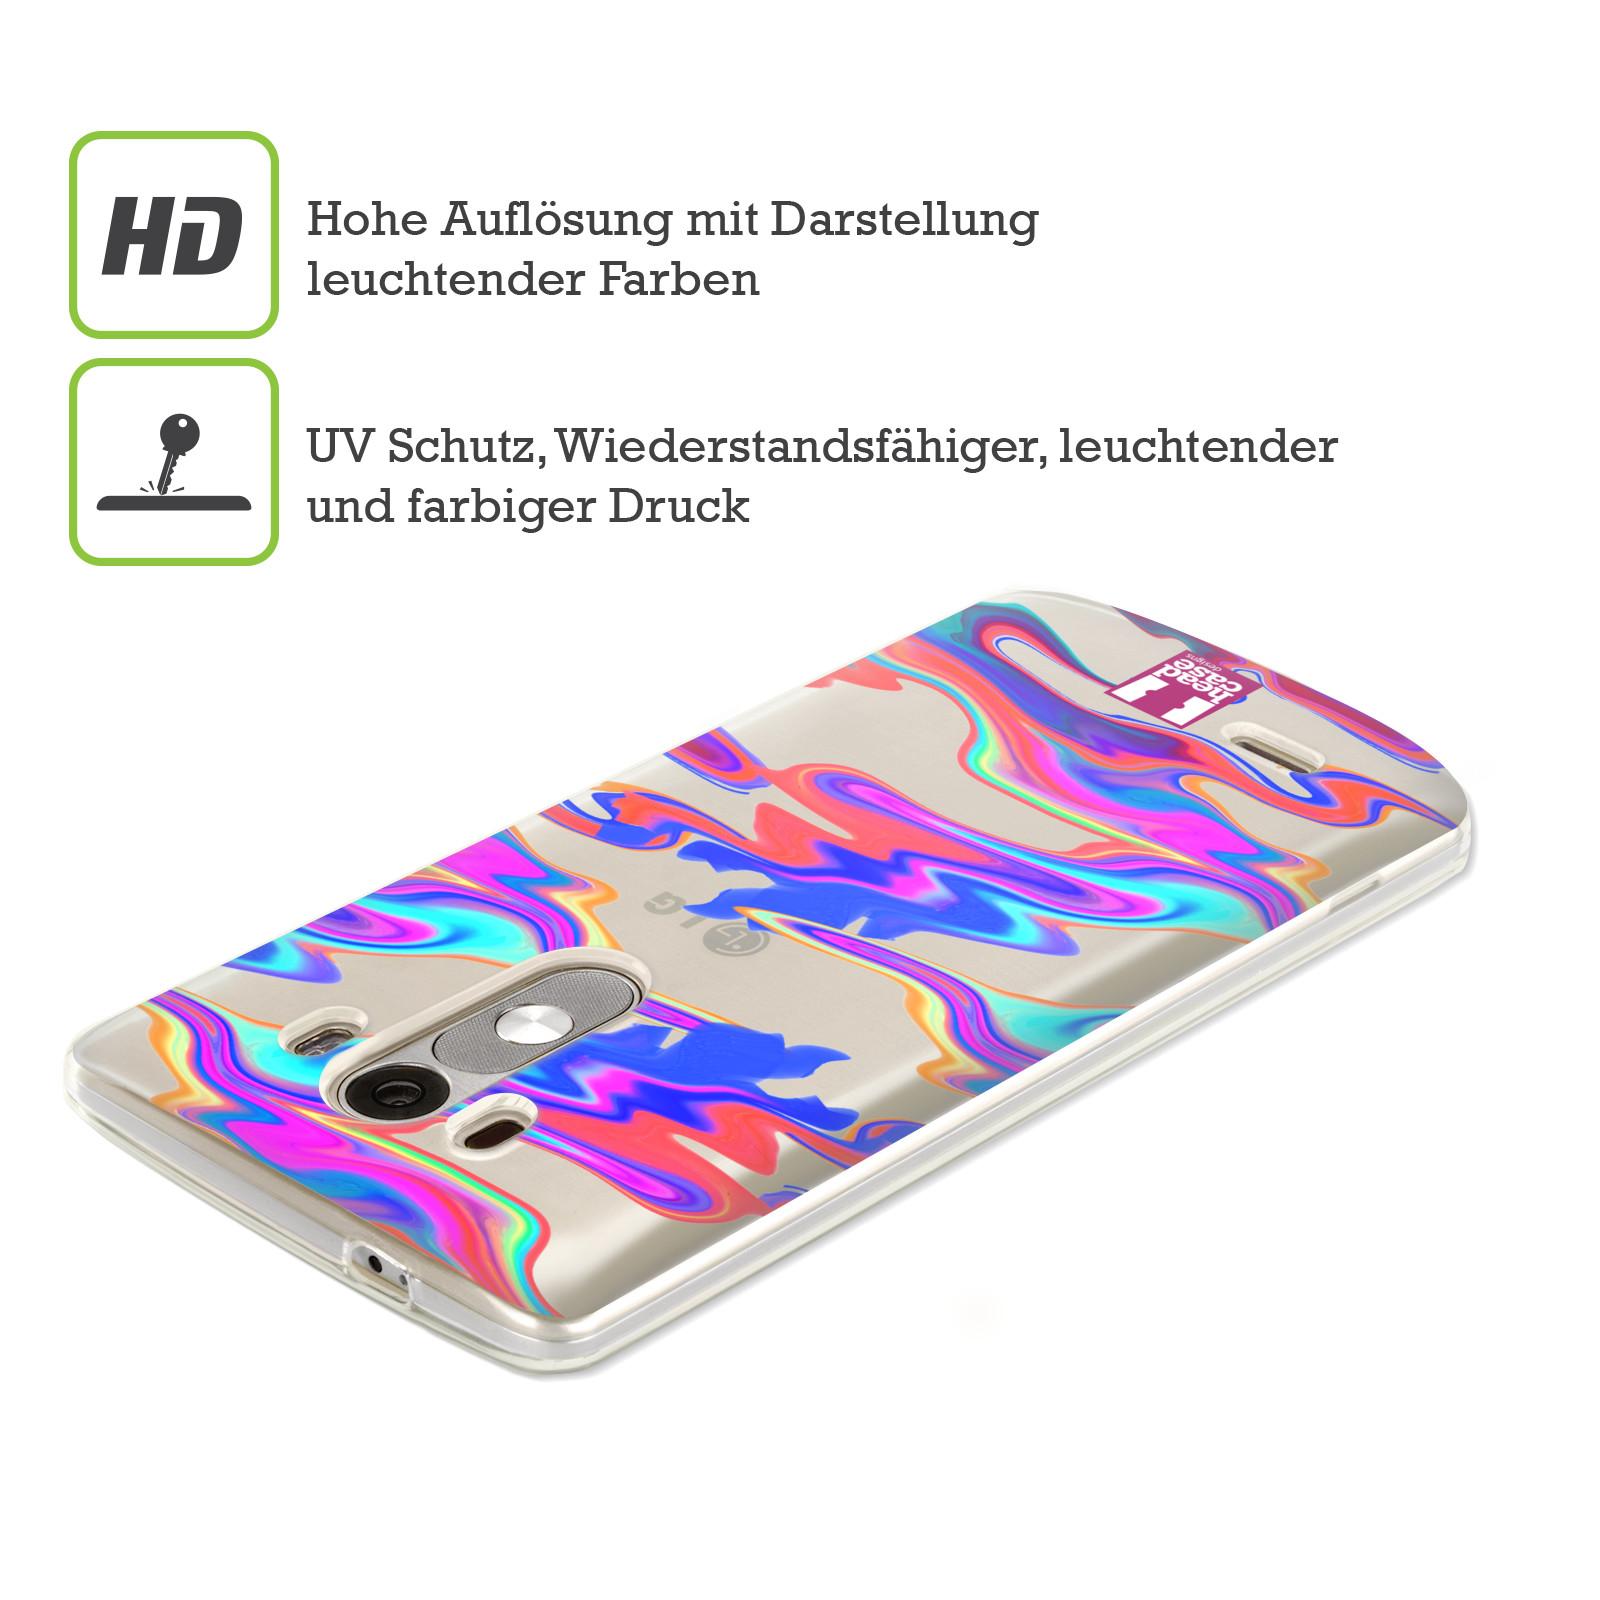 HEAD-CASE-DESIGNS-FARBIG-ABSTRAKT-SOFT-GEL-HULLE-FUR-LG-HANDYS-2